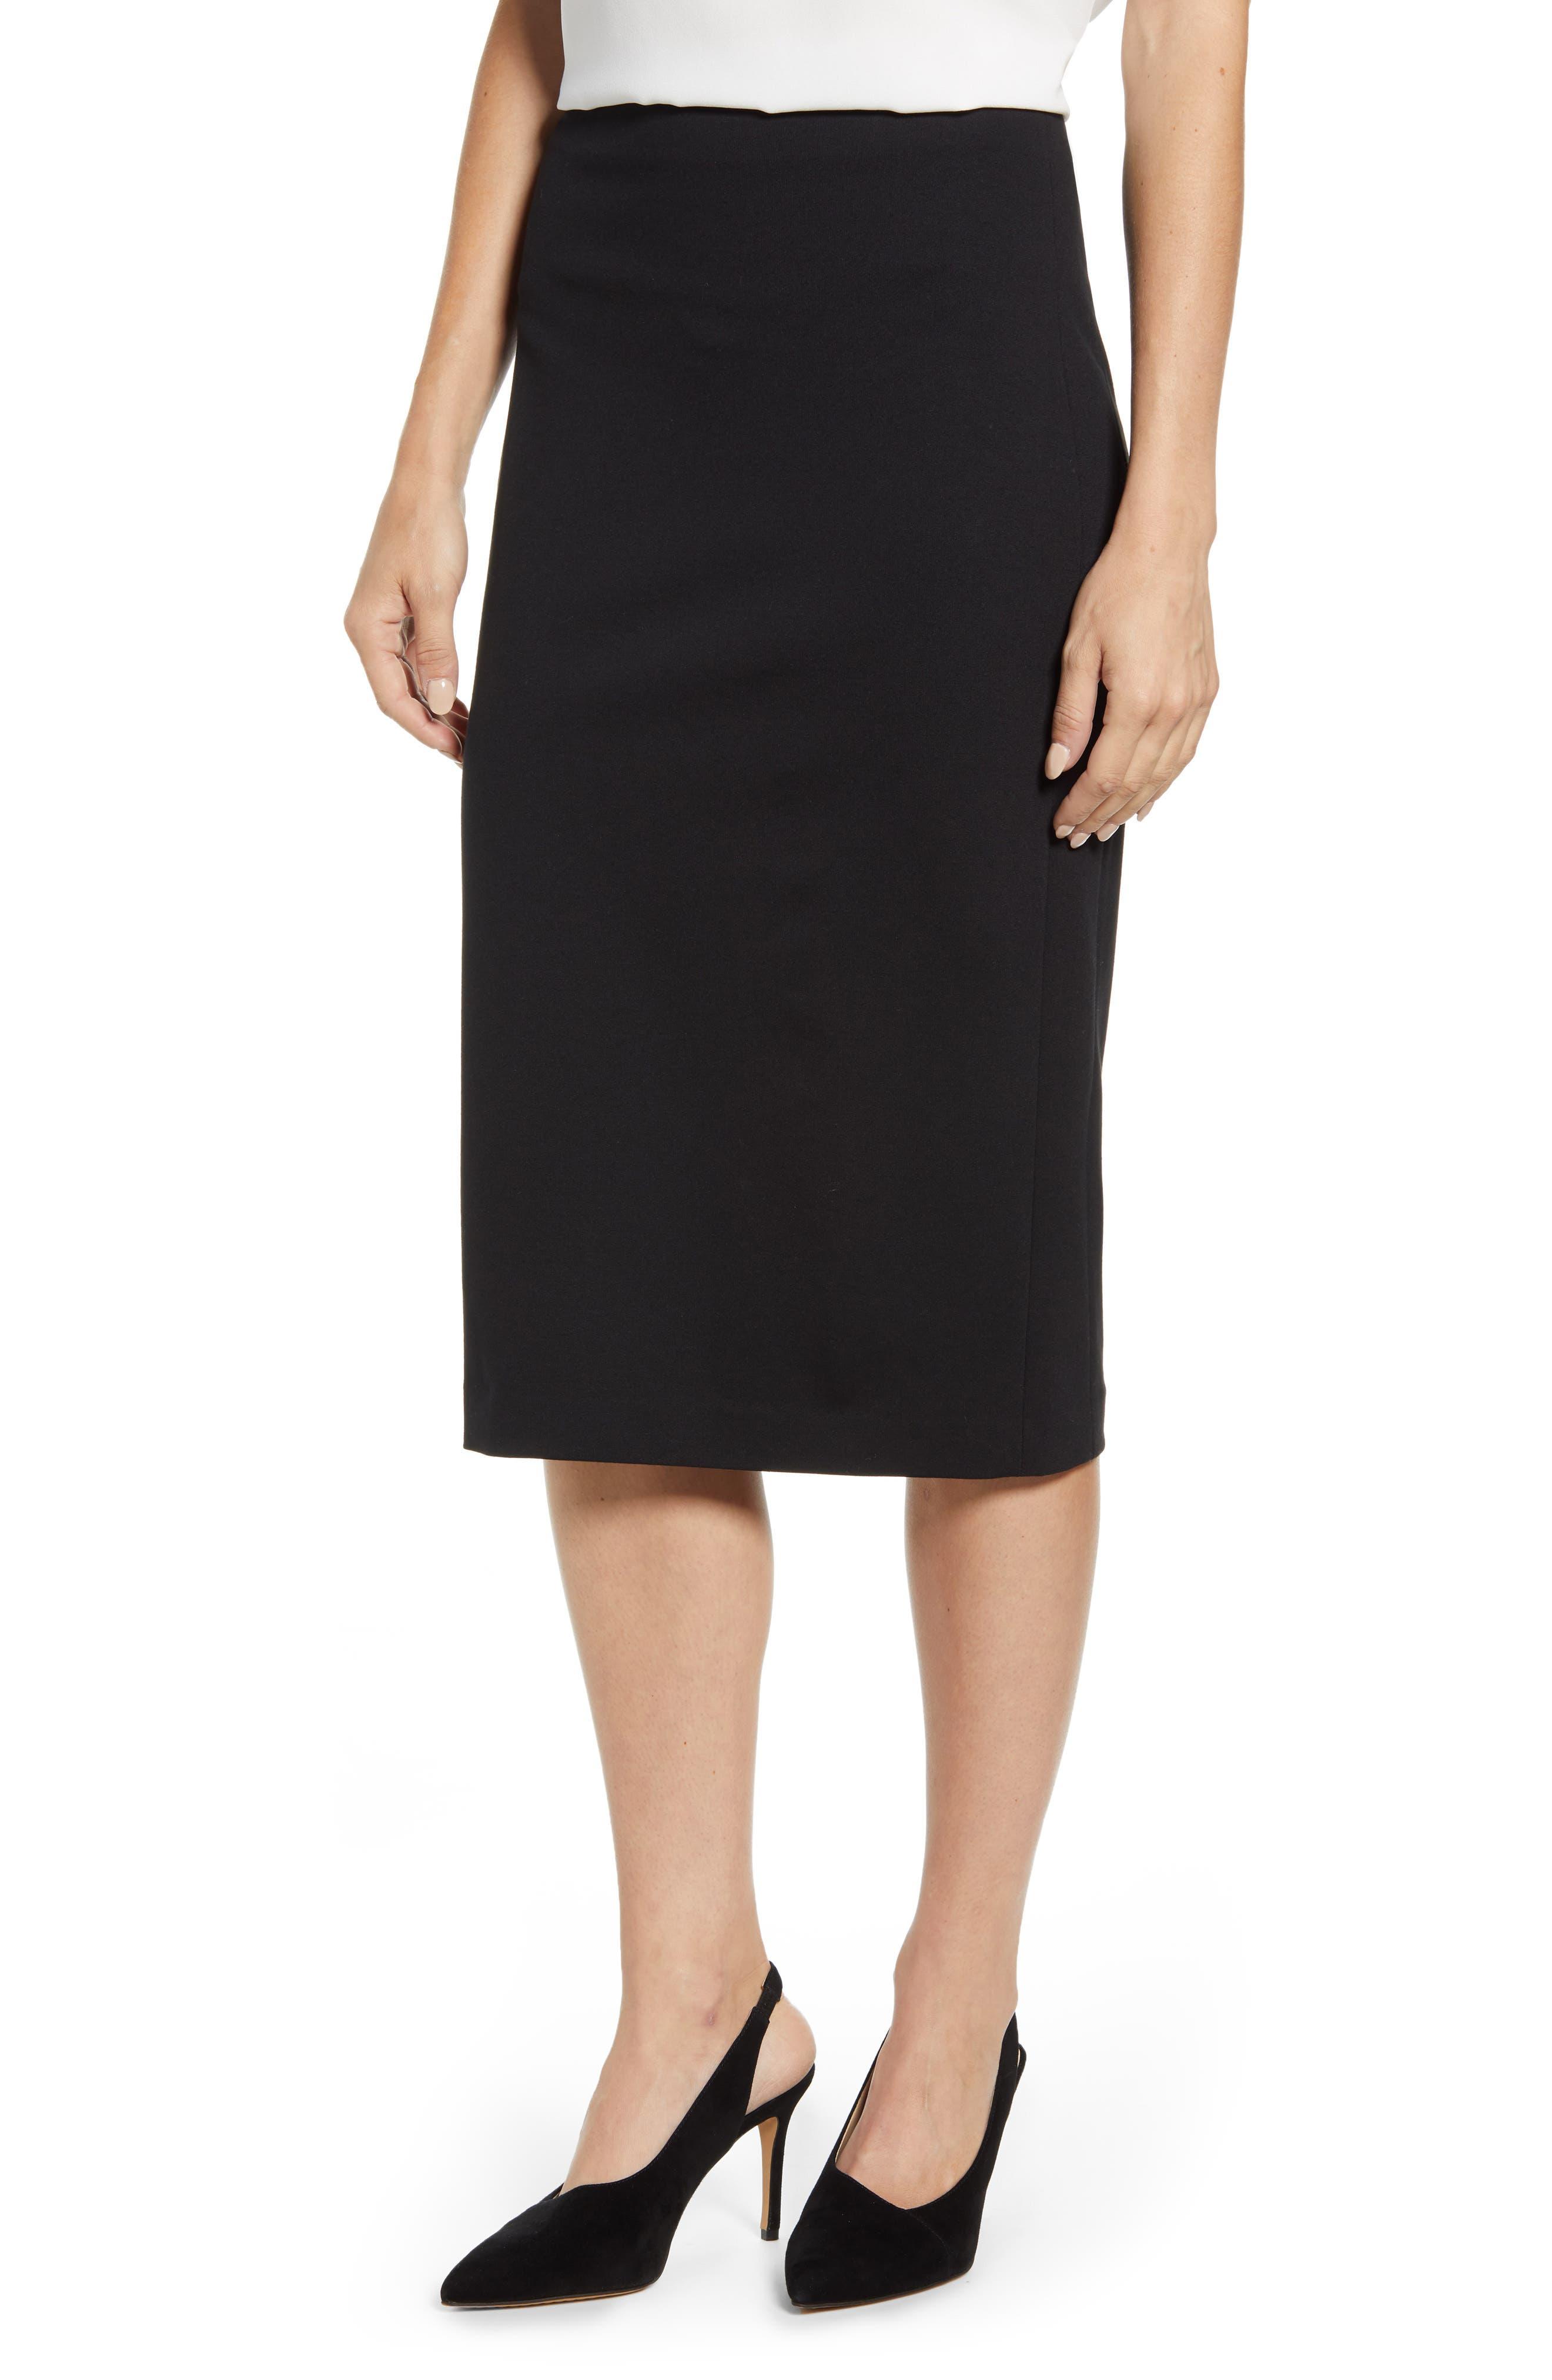 VINCE CAMUTO, Ponte Midi Skirt, Main thumbnail 1, color, RICH BLACK